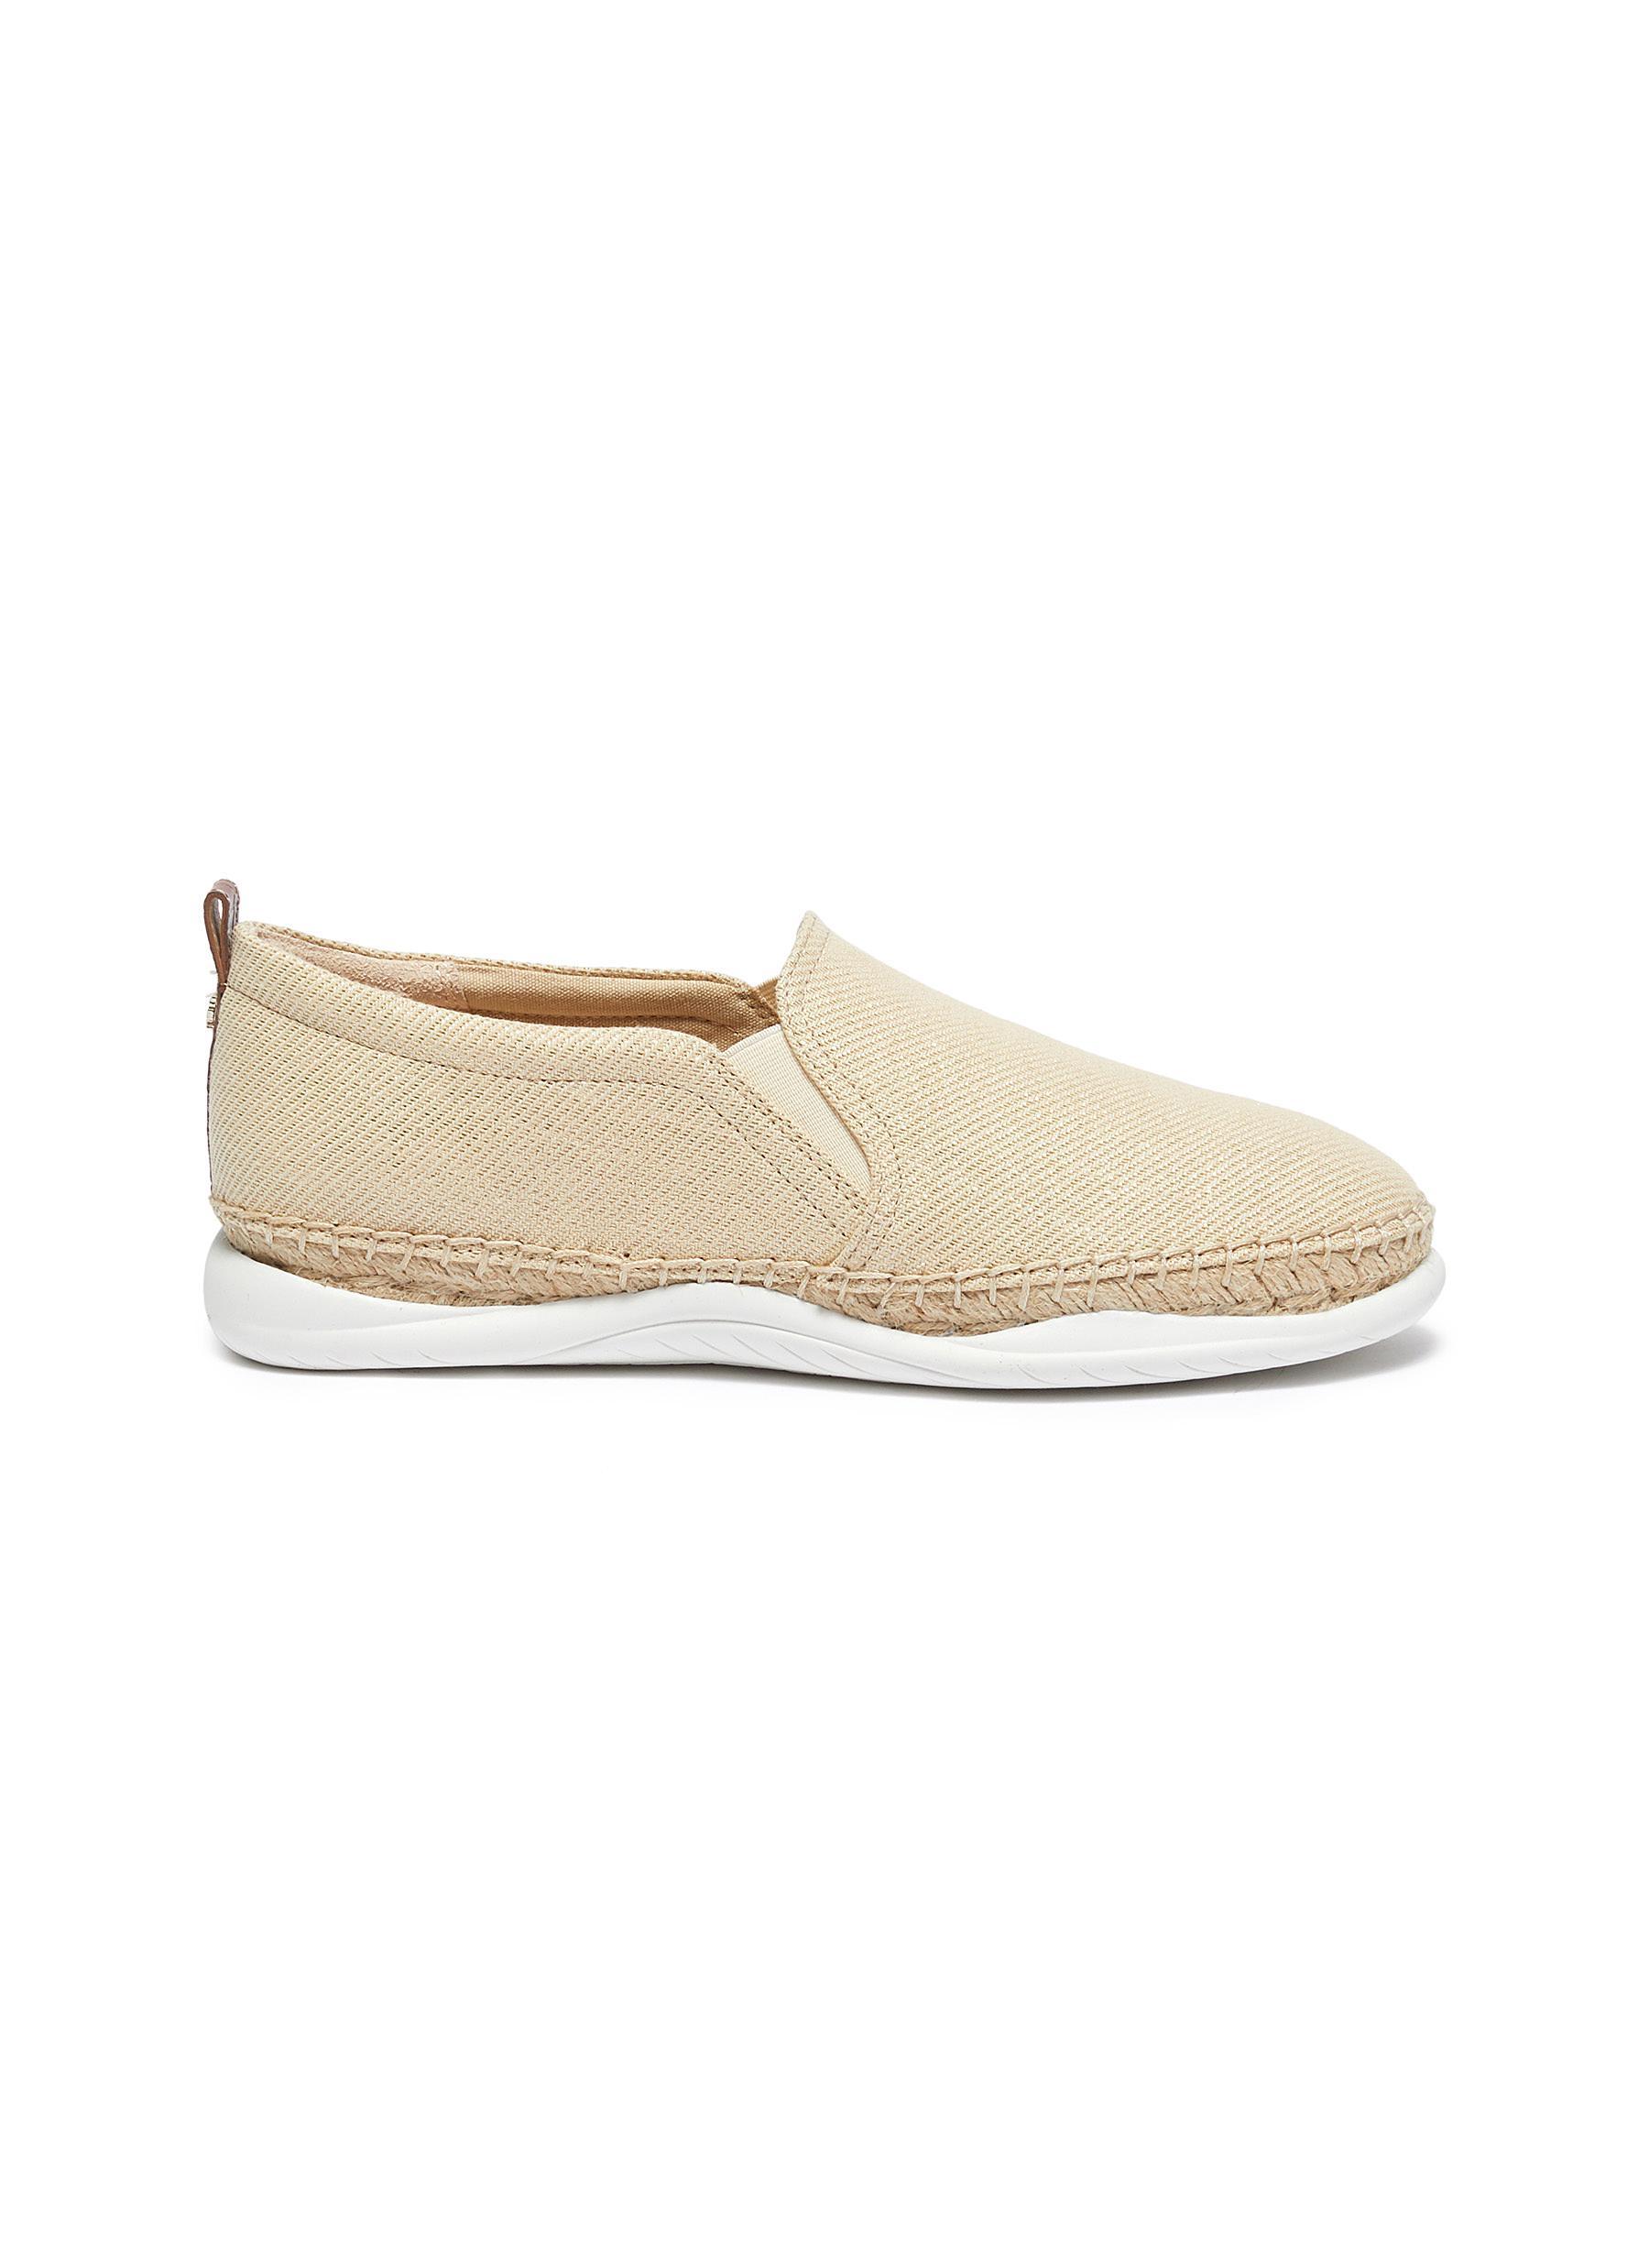 b1382429b258 Sam Edelman.  Kassie  leather espadrille flatform slip-on sneakers